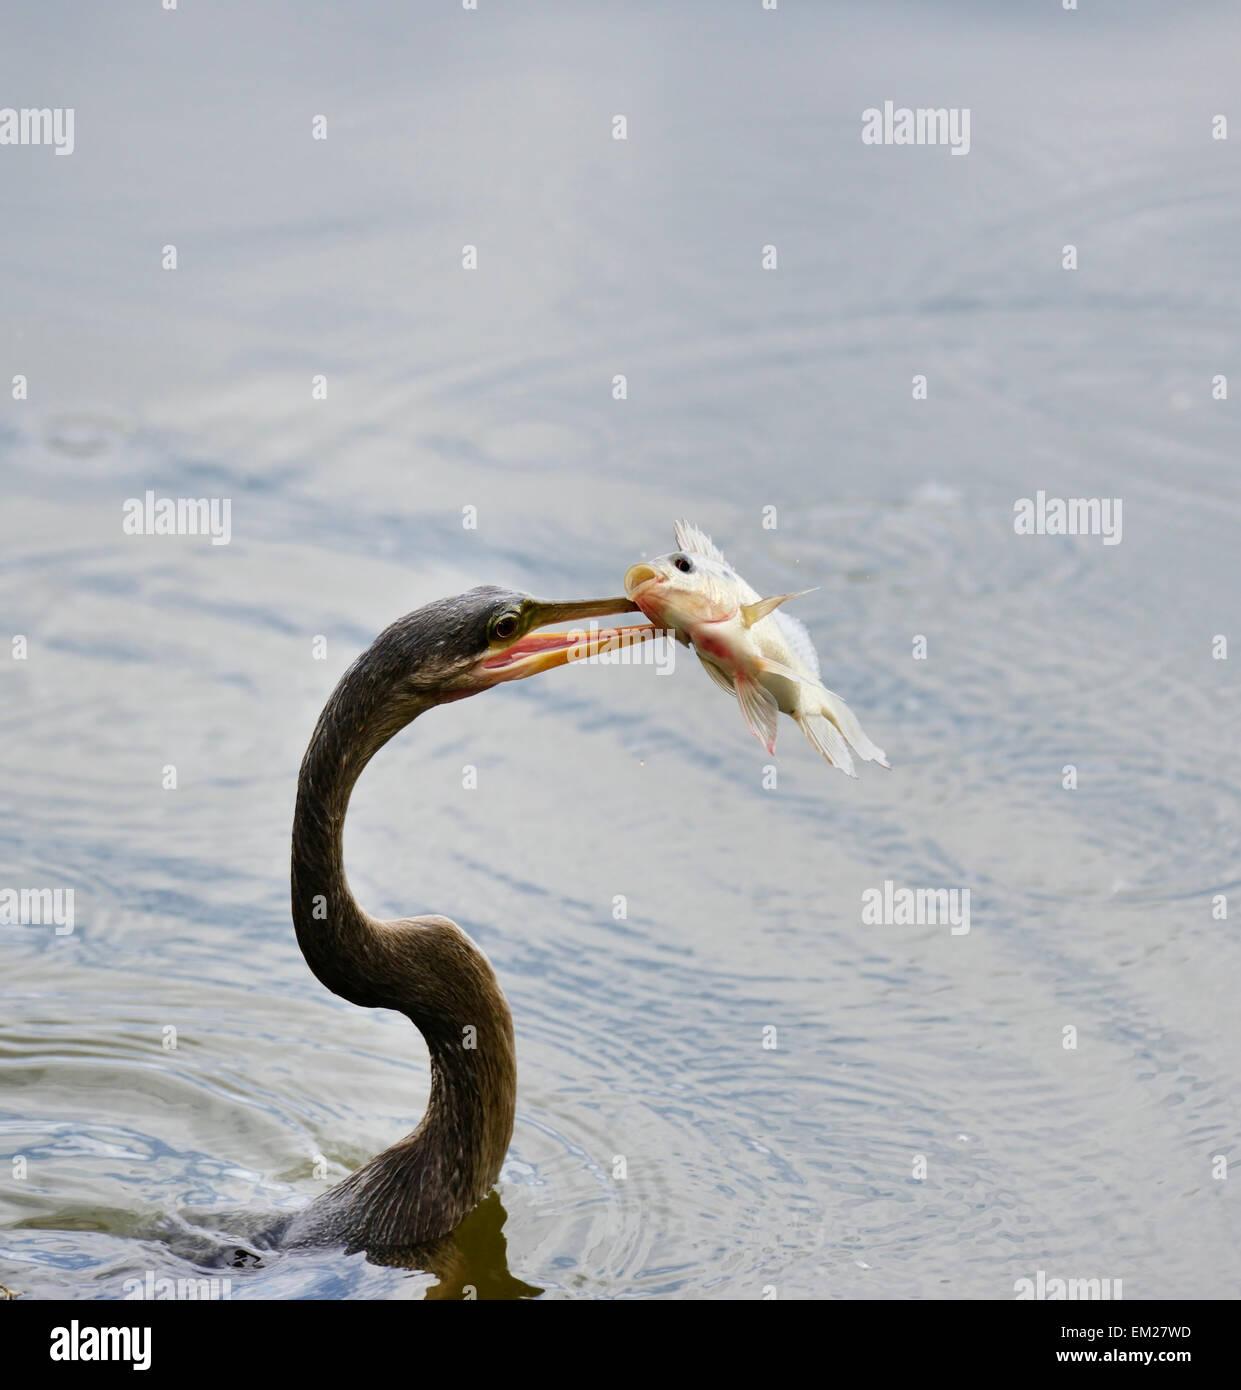 Anhinga Downing A Fish In Florida Wetlands - Stock Image